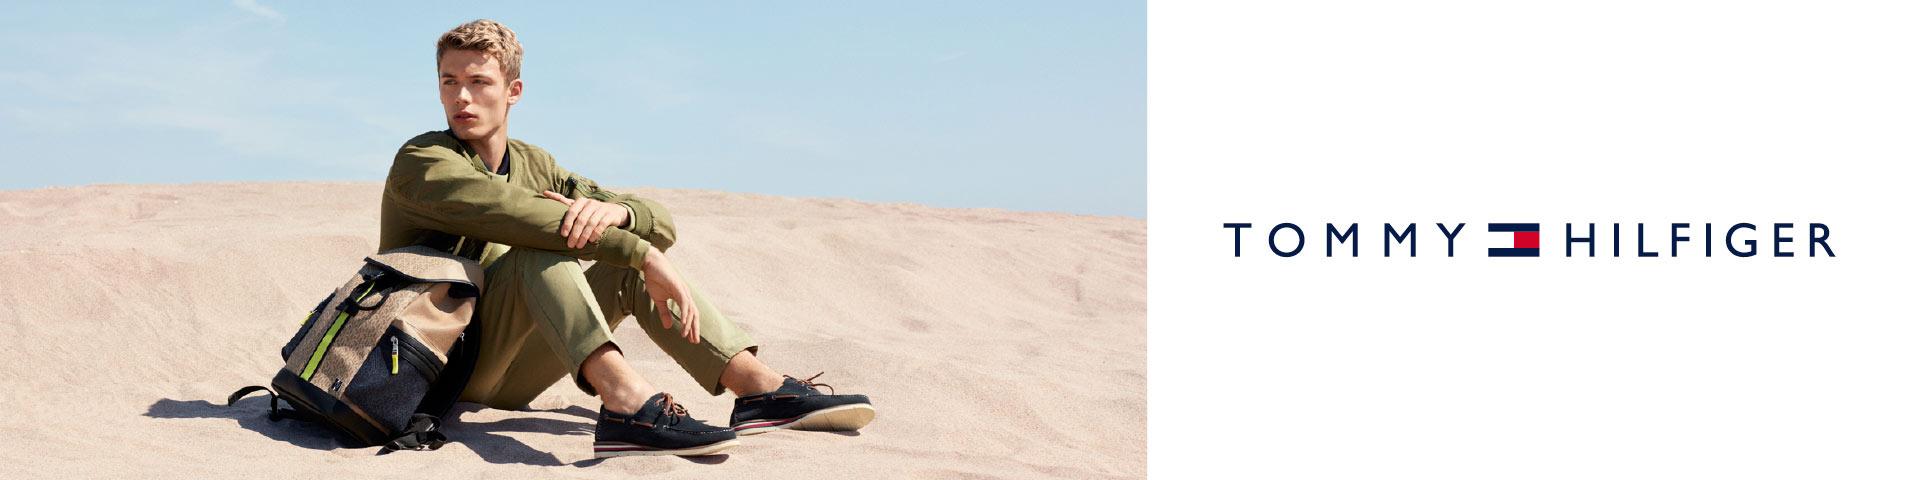 Scarpe da uomo Tommy Hilfiger | Scopri su Zalando